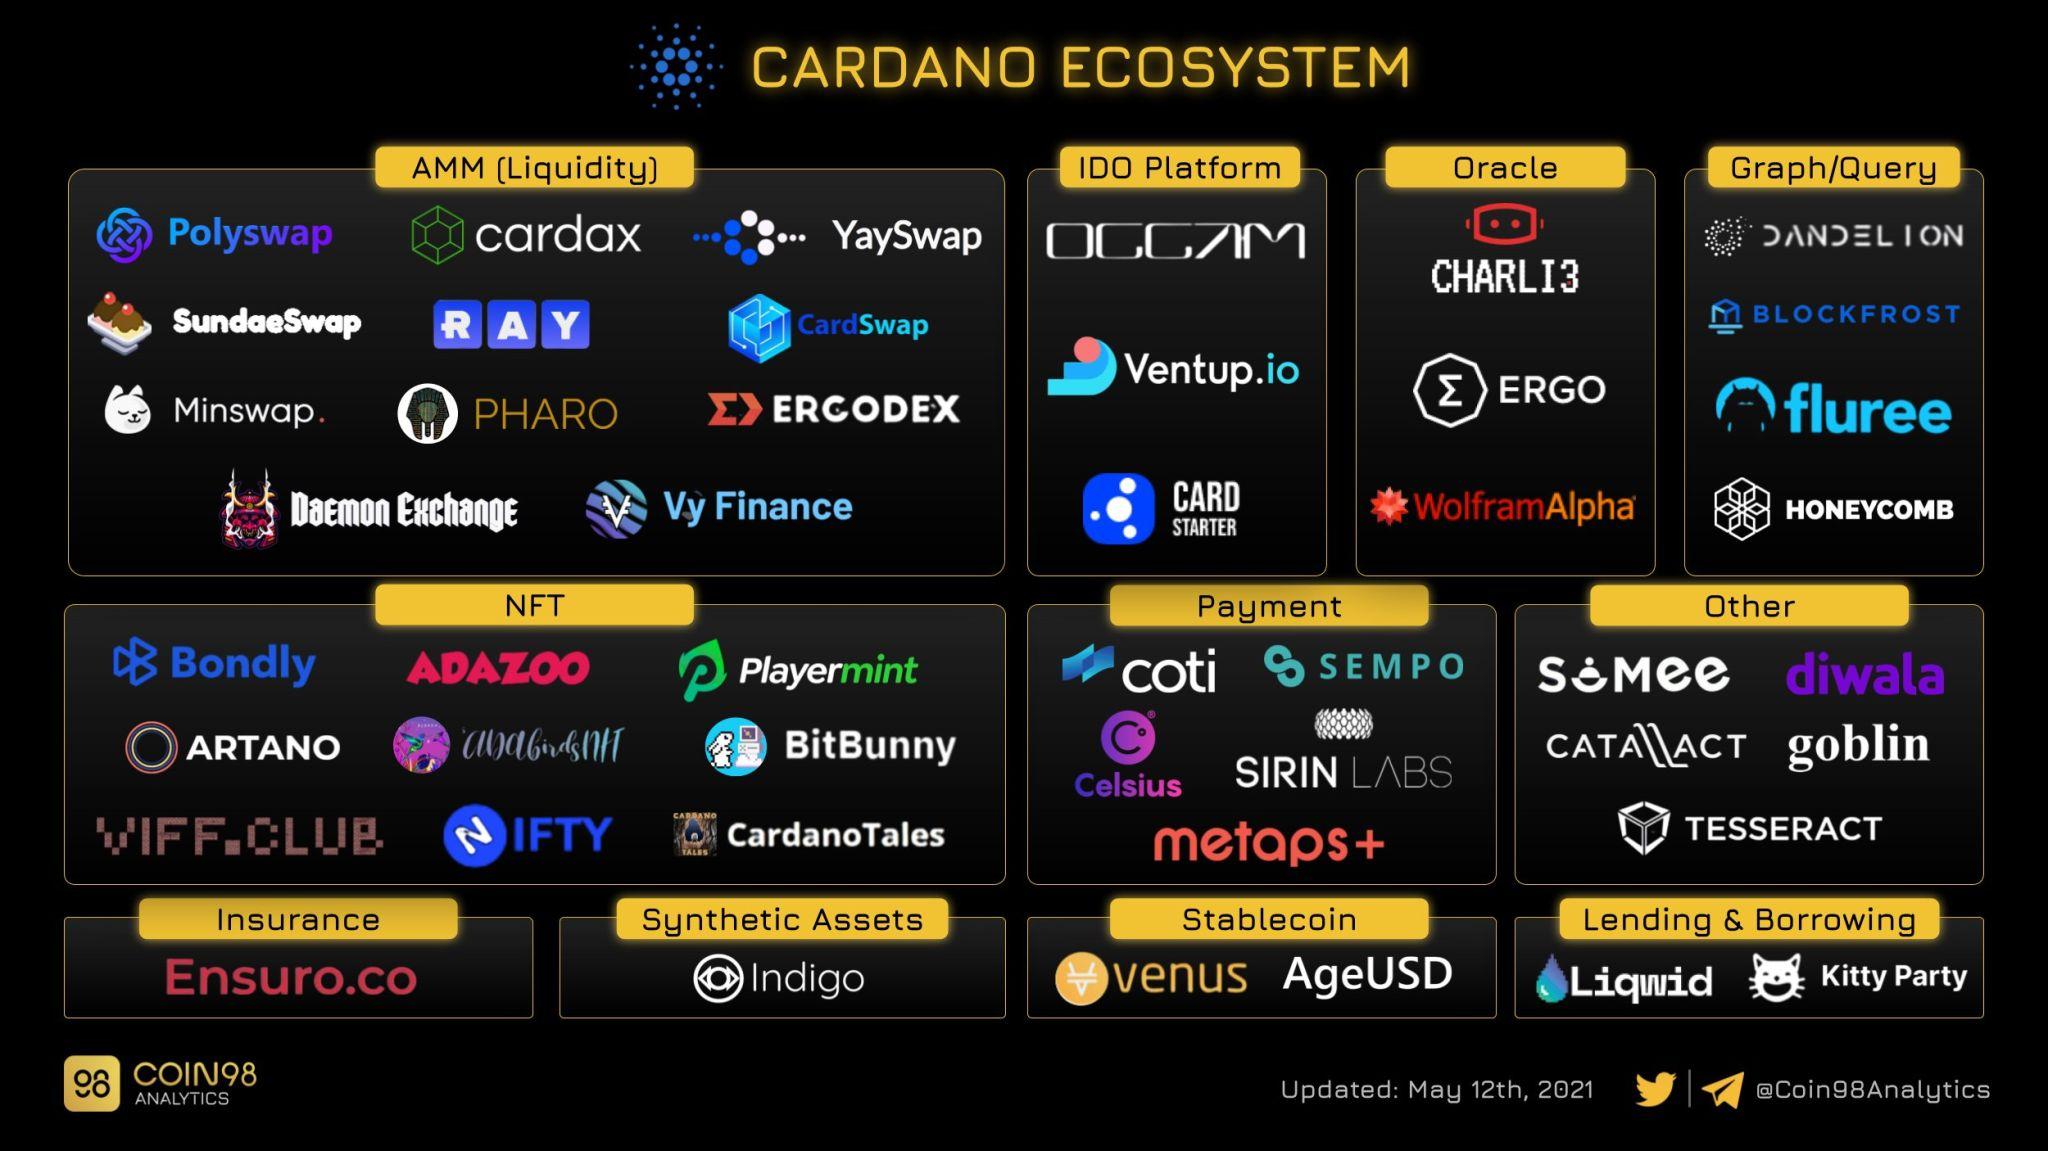 cardano_ecosystem.jpg